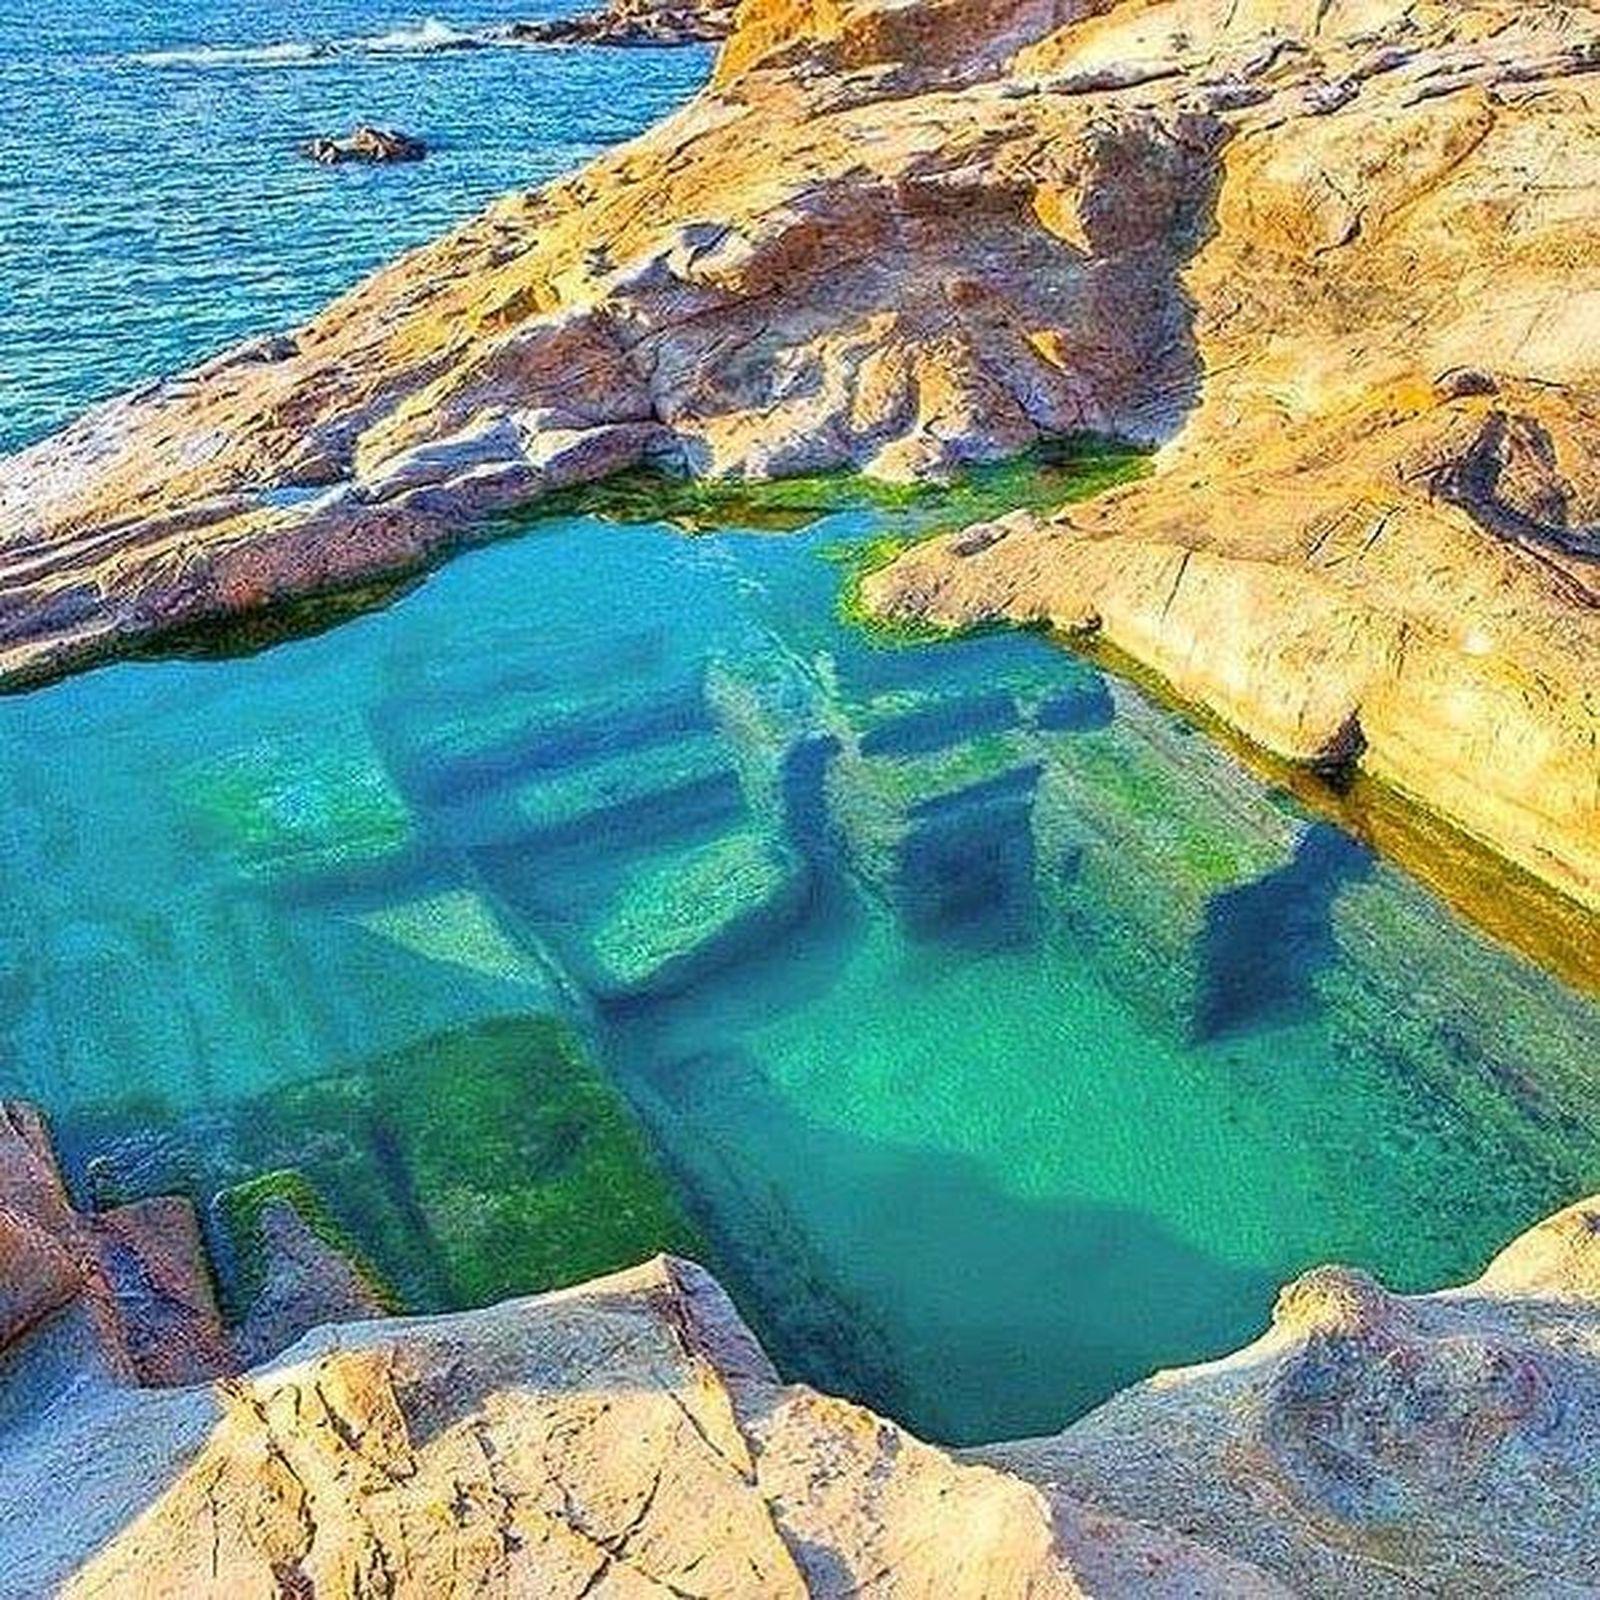 Atlantis, Ibiza's secret mythical cove